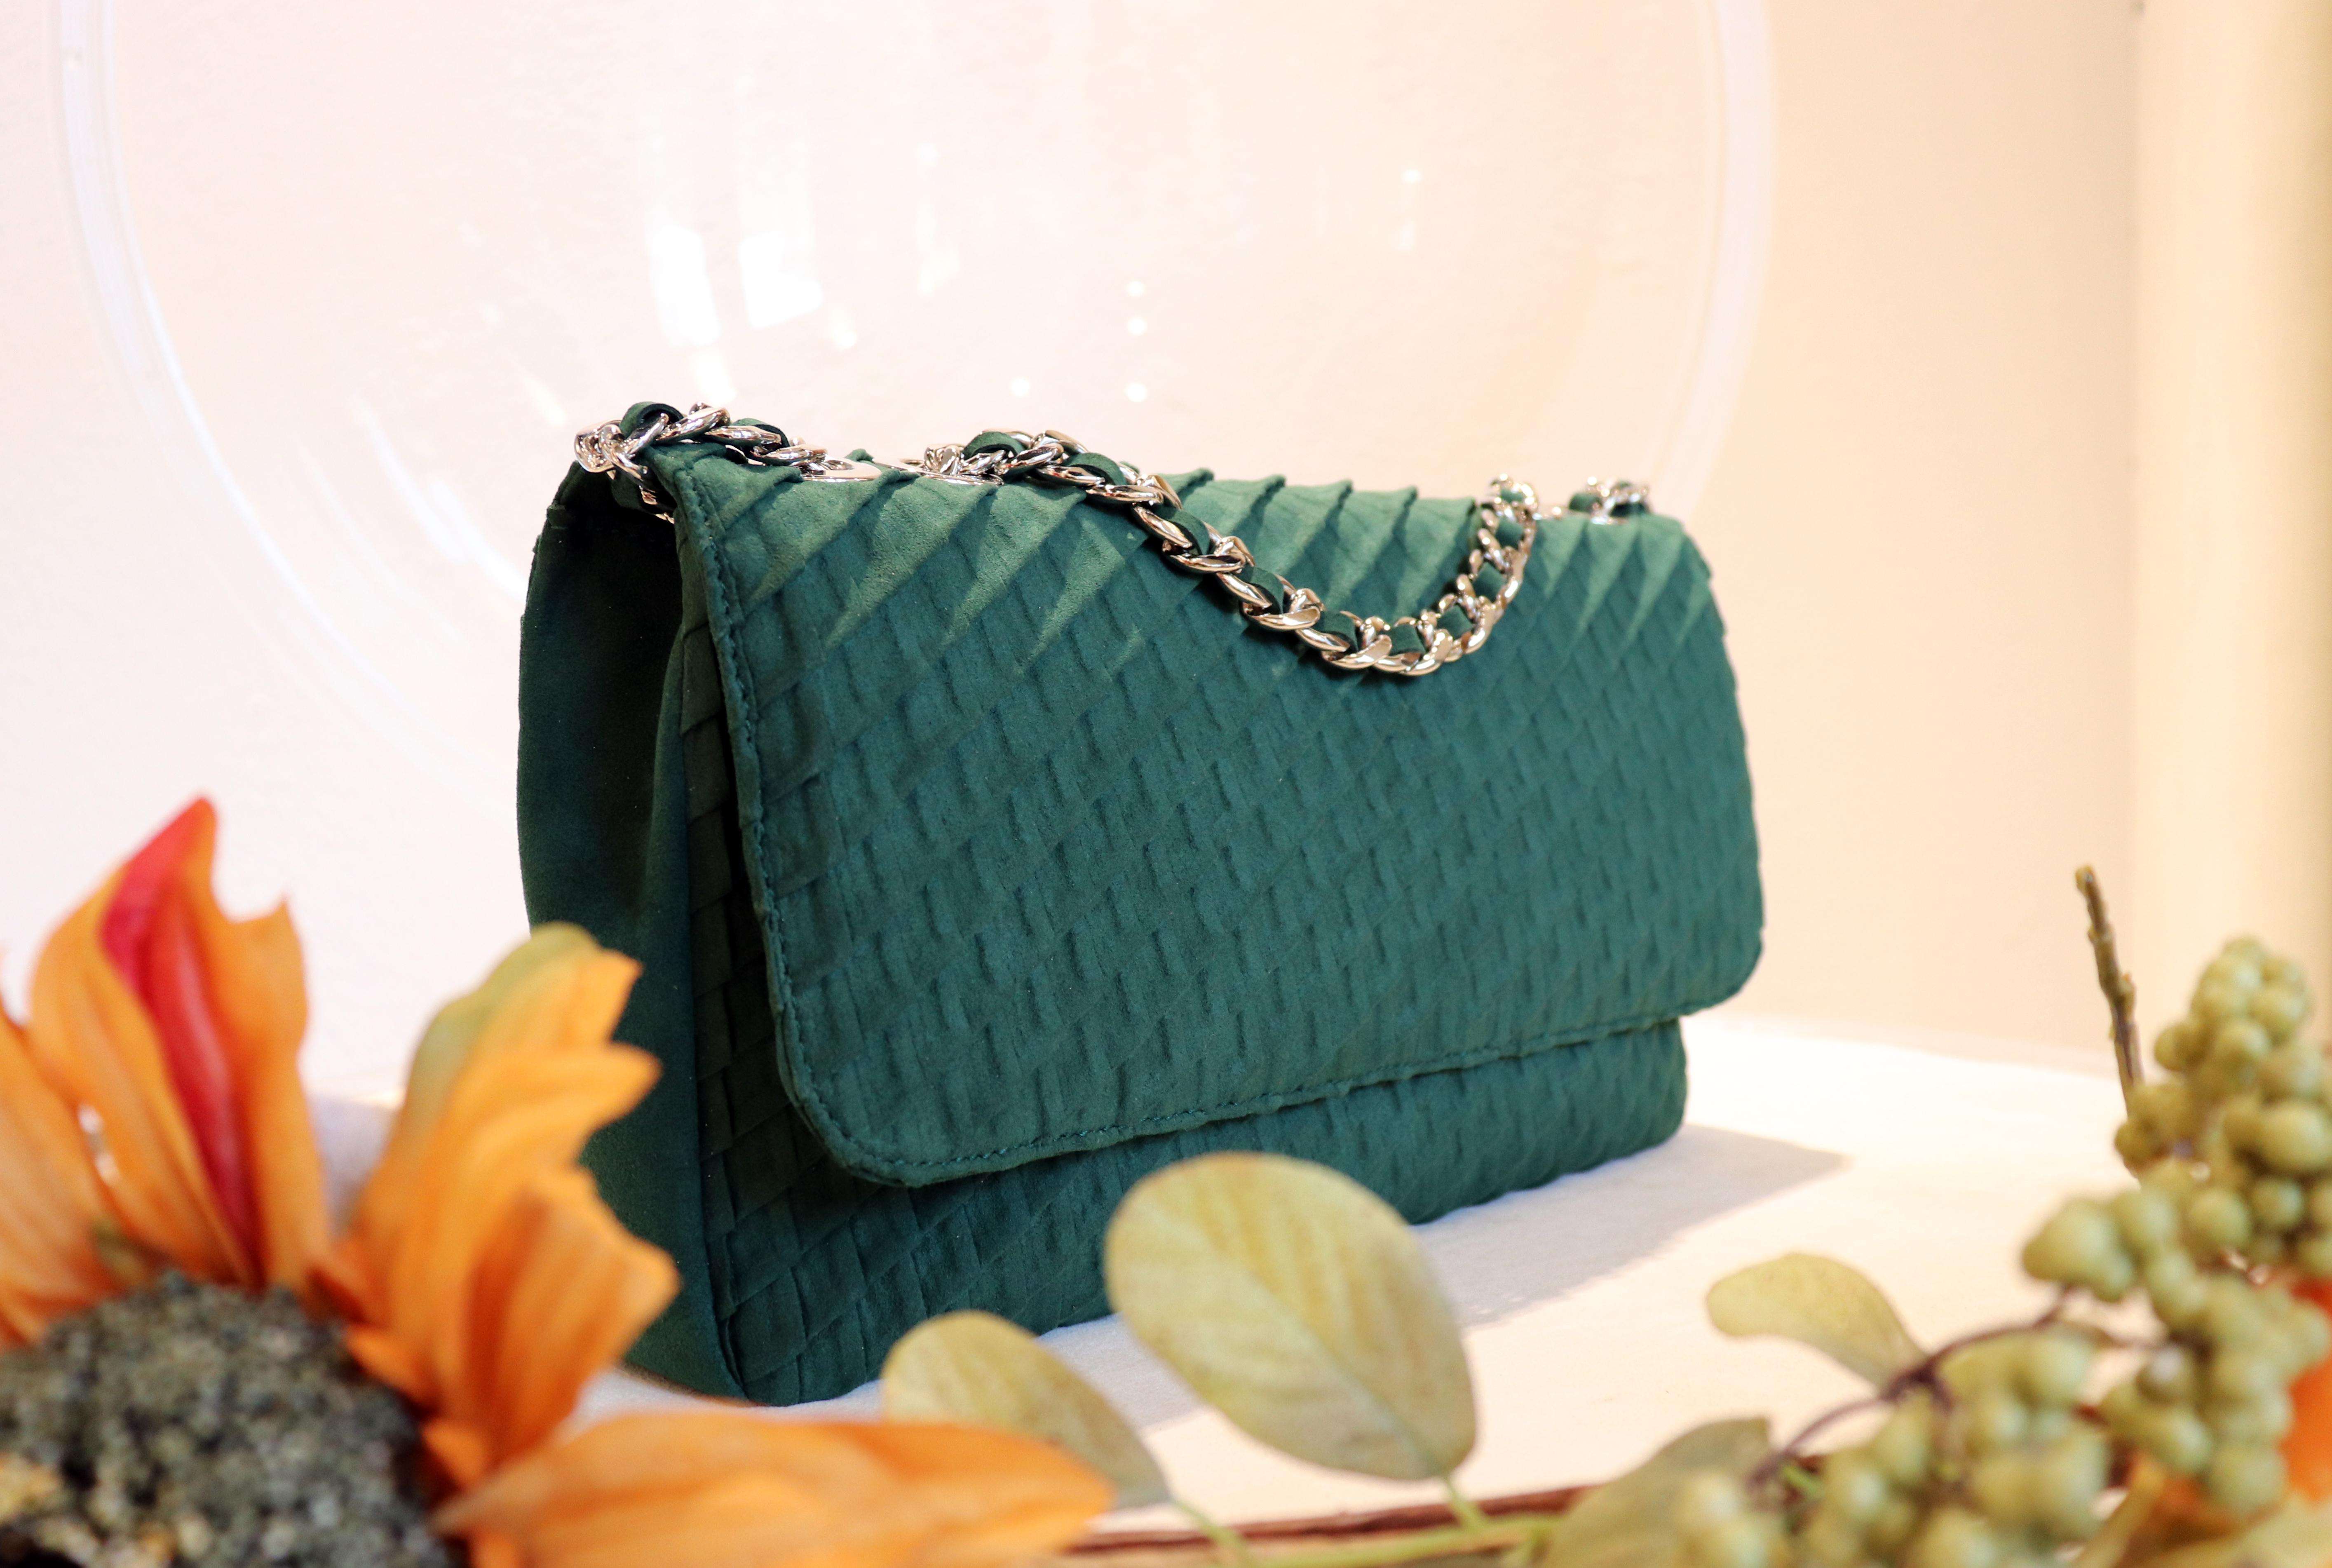 01_a_Alcantara_clutch_green (1)